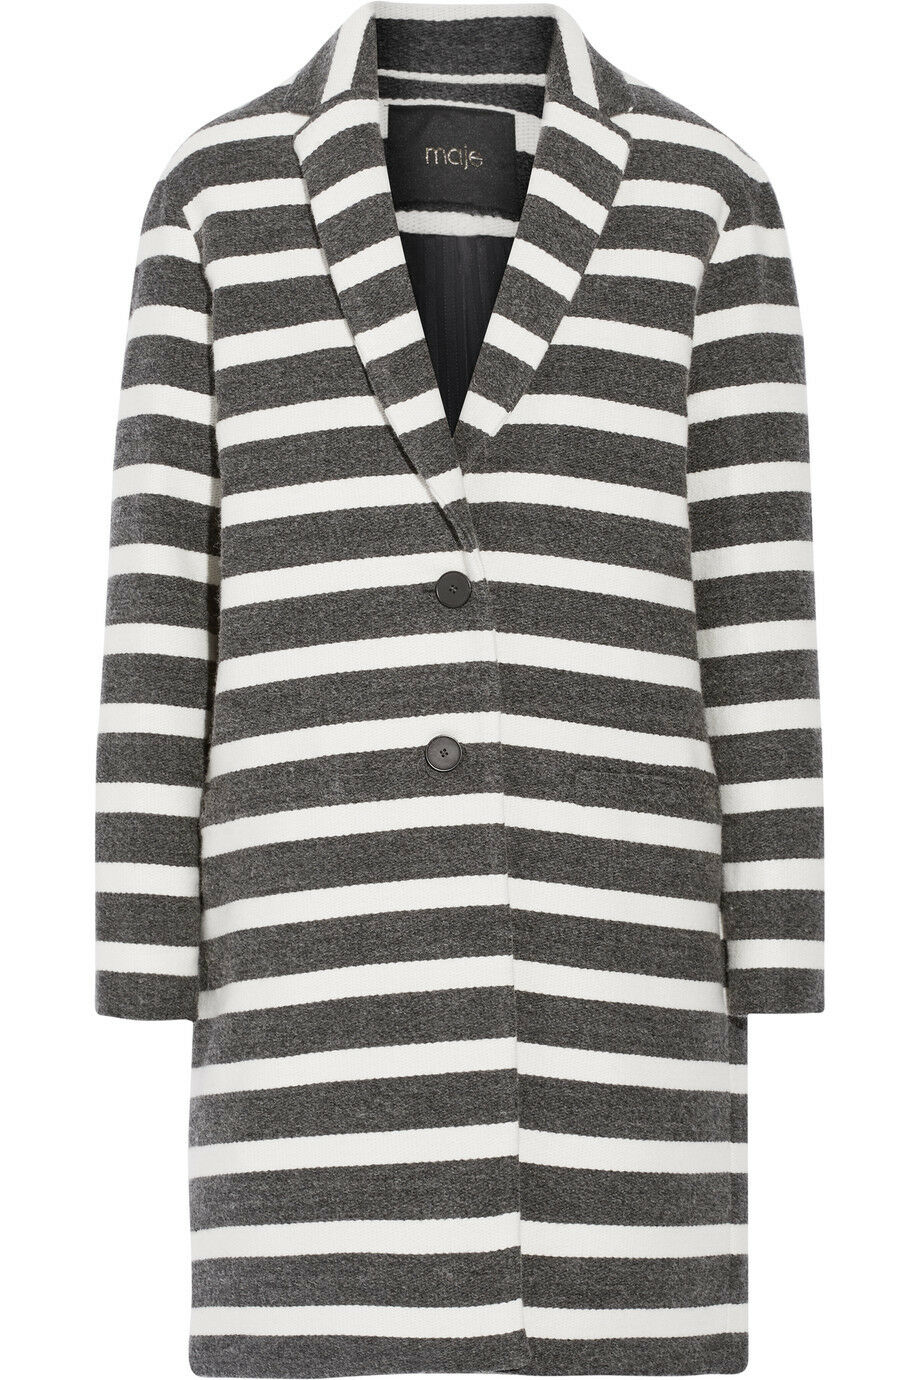 Maje grey and white striped coat French 36 UK8